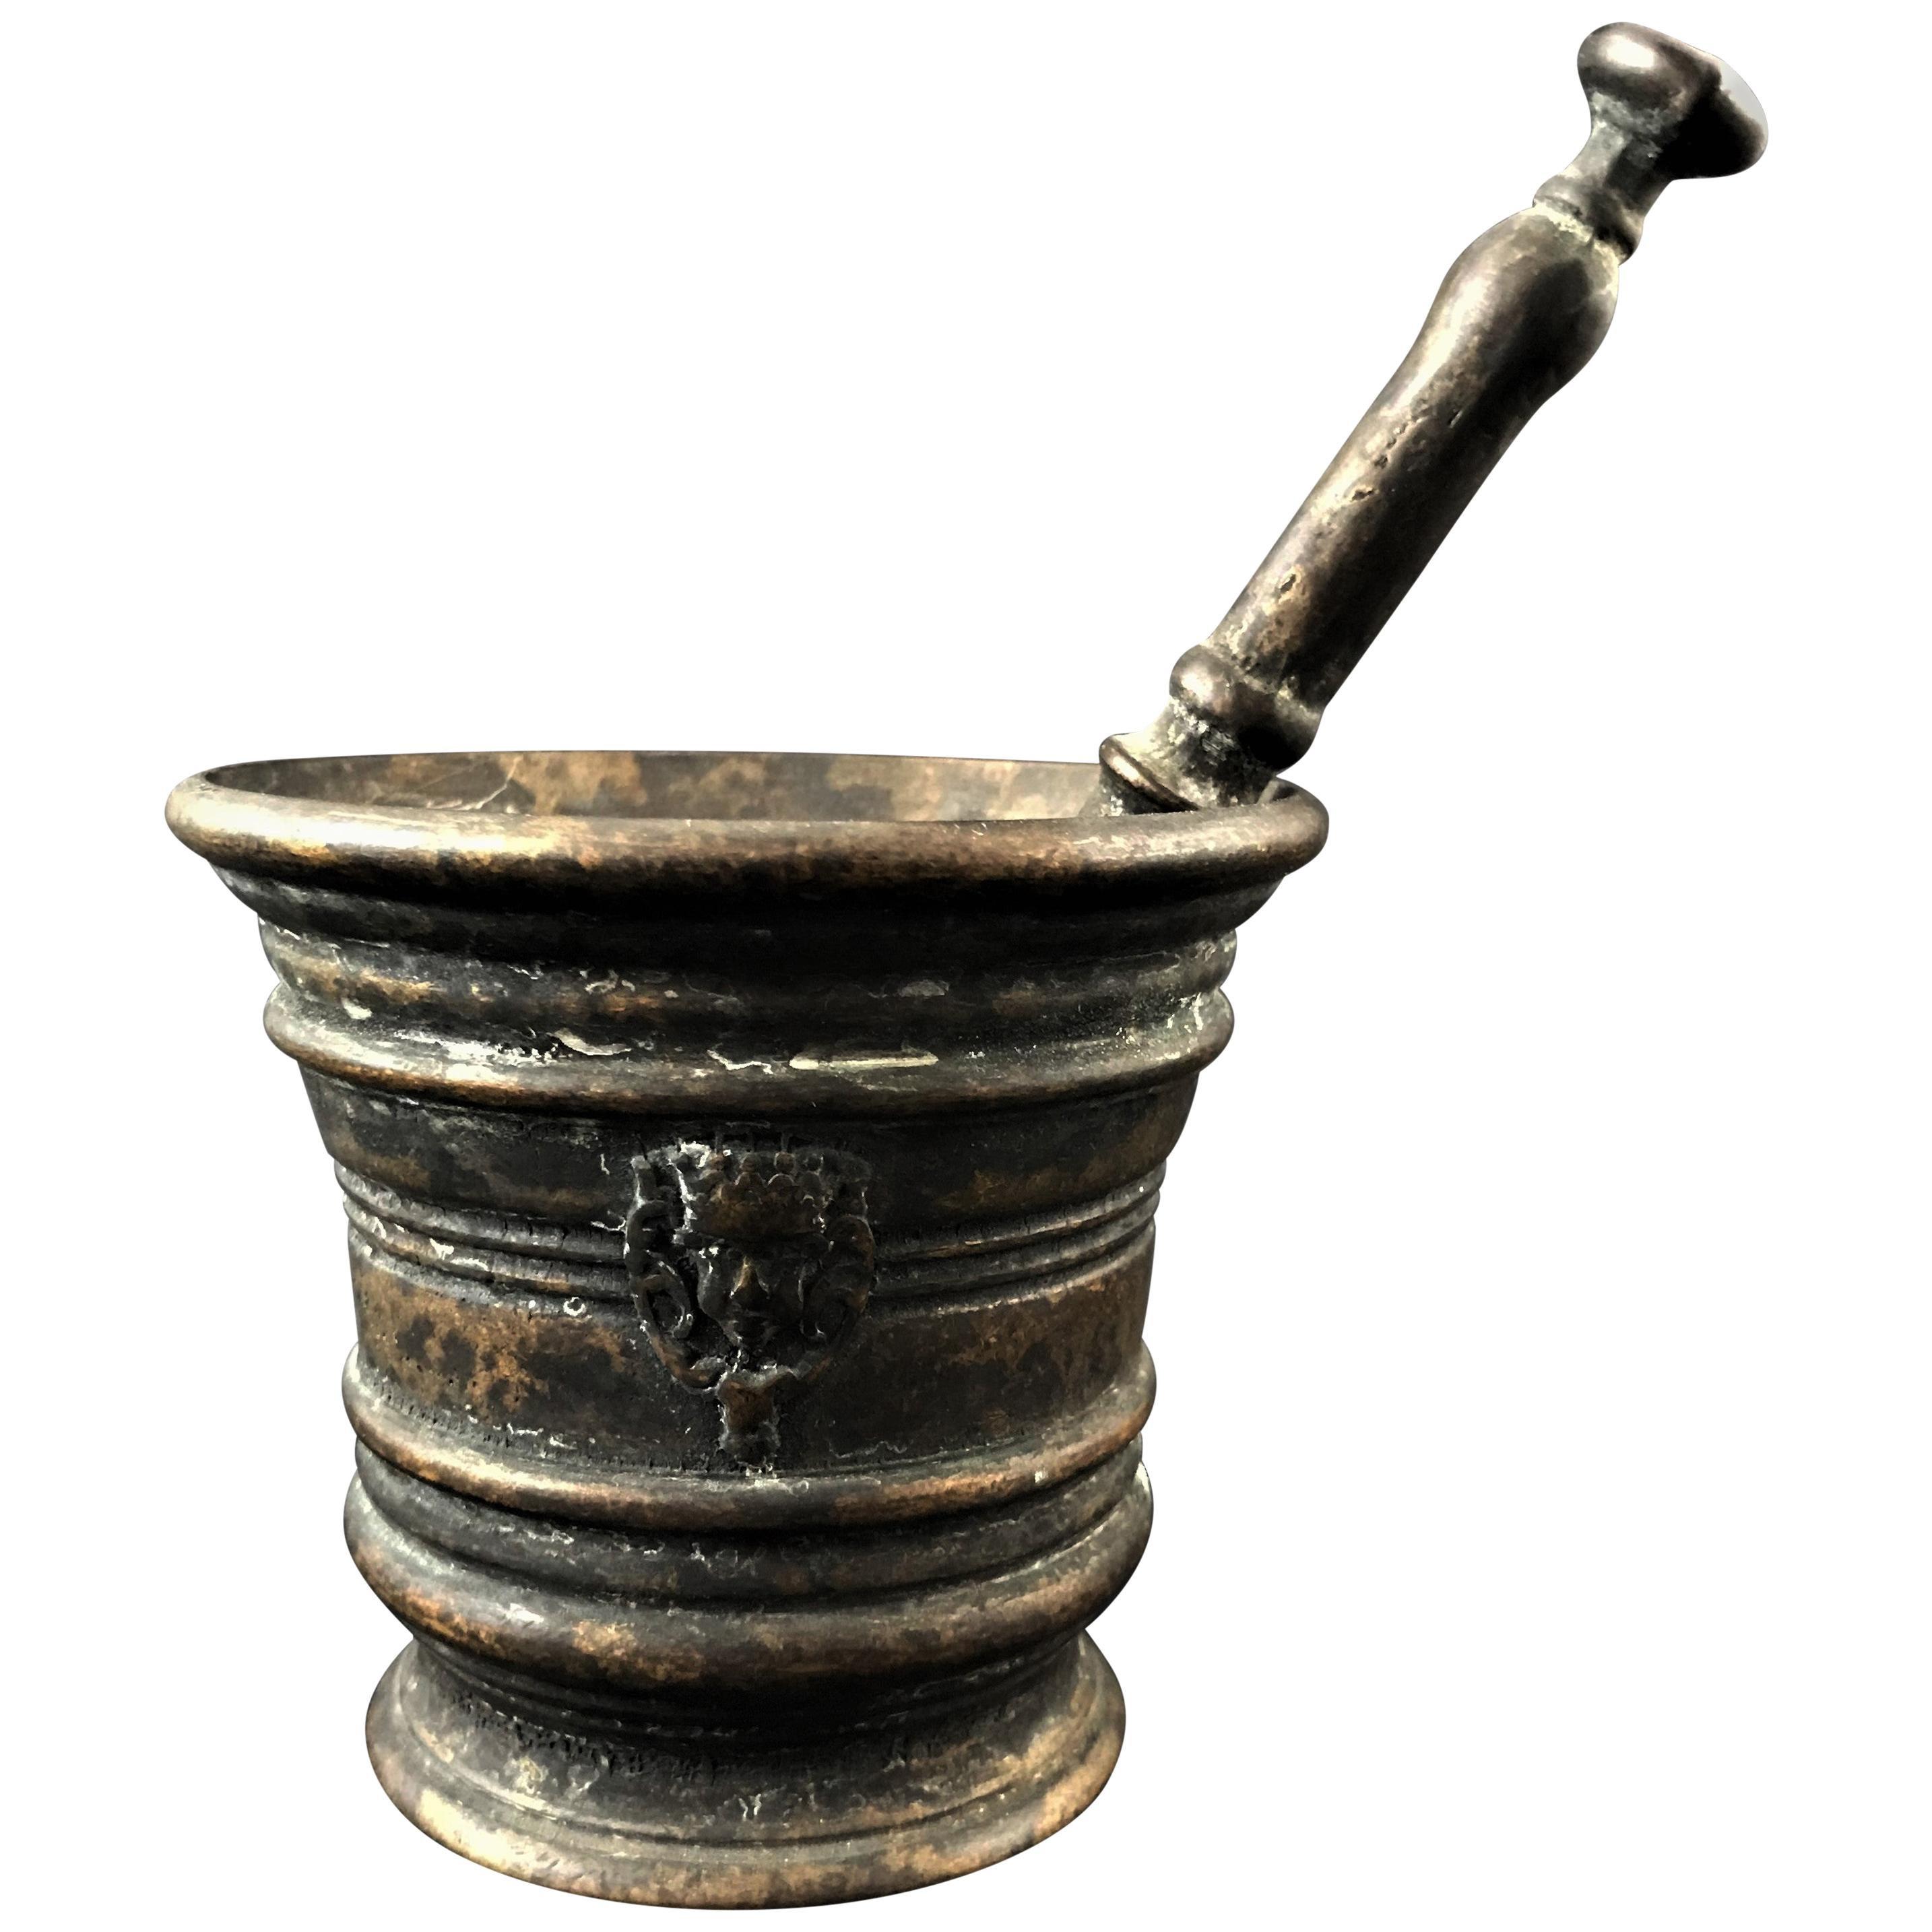 Bronze Mortar with Mascarons